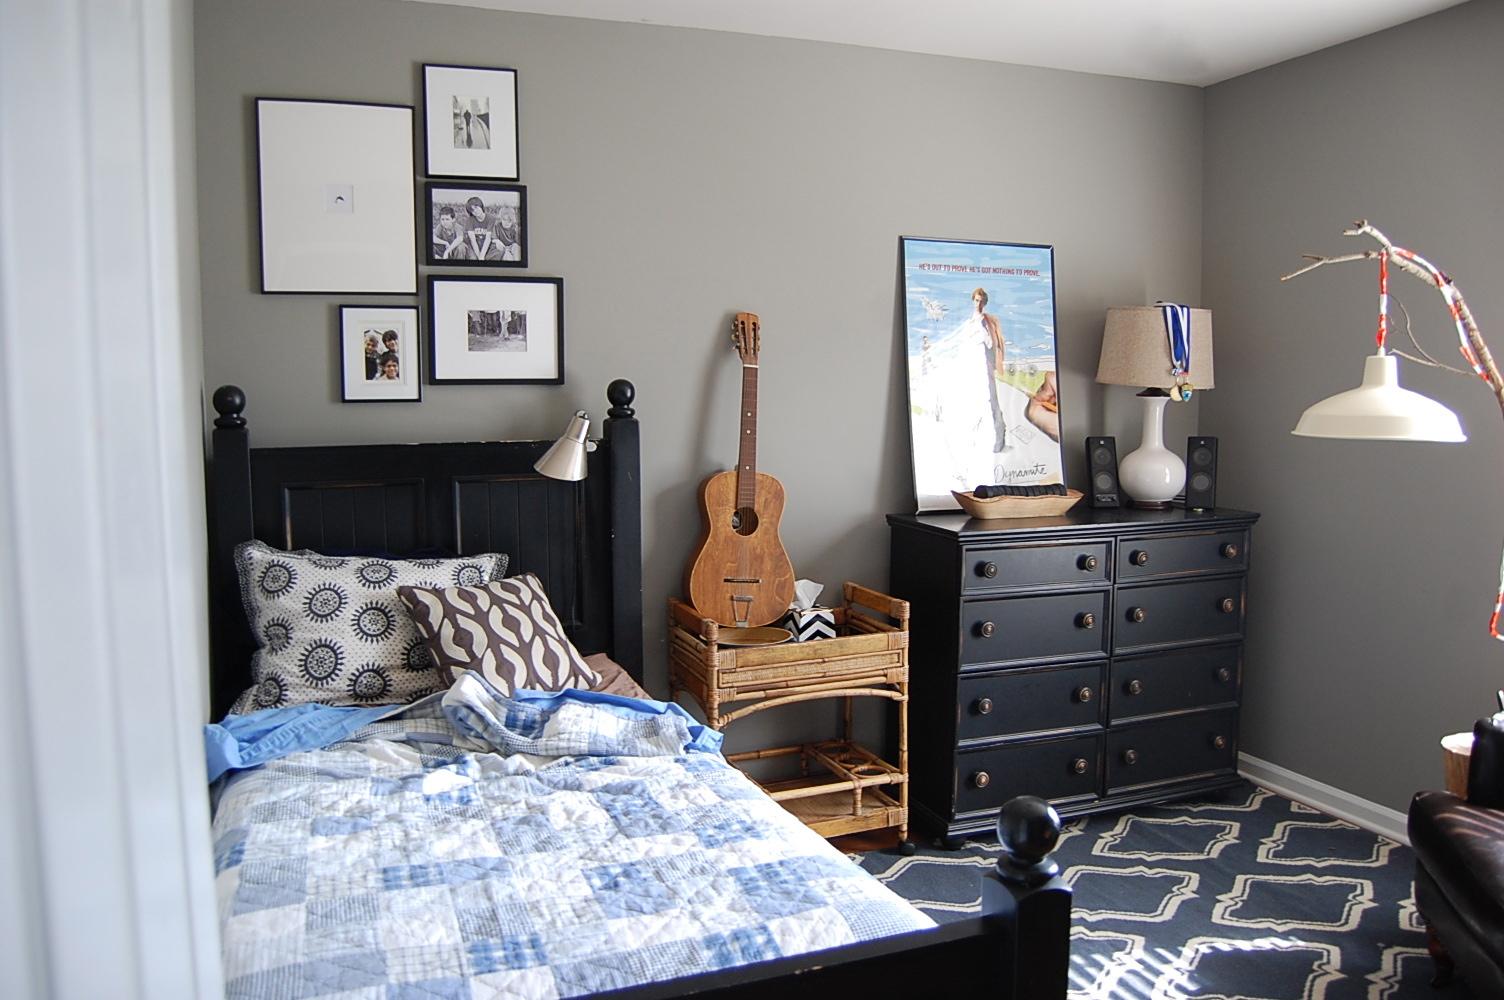 desain kamar tidur laki-laki dewasa | homkonsep